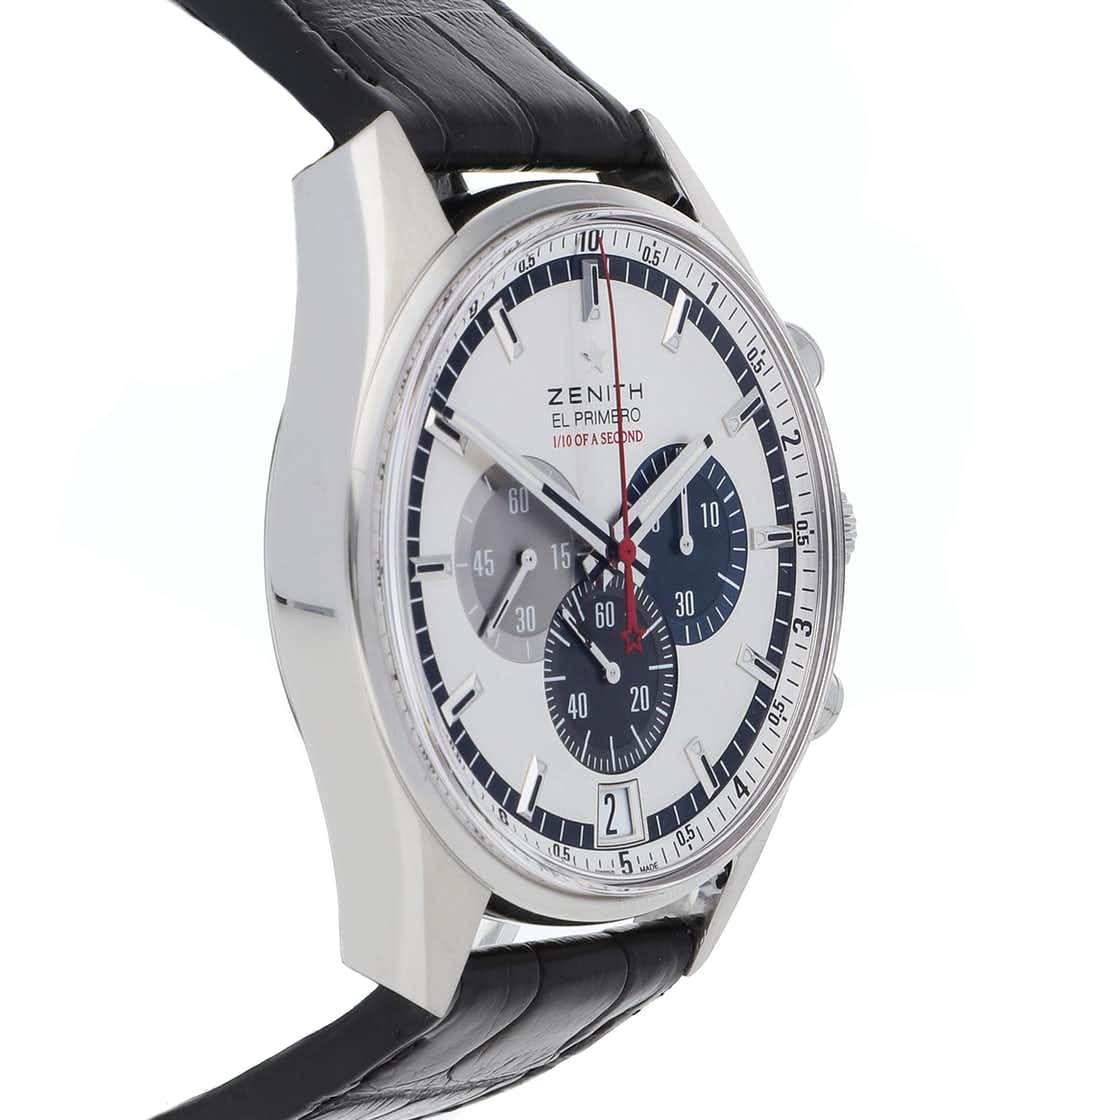 Zenith El Primero Striking 10th Chronograph Limited Edition 03.2041.4052/69.C496